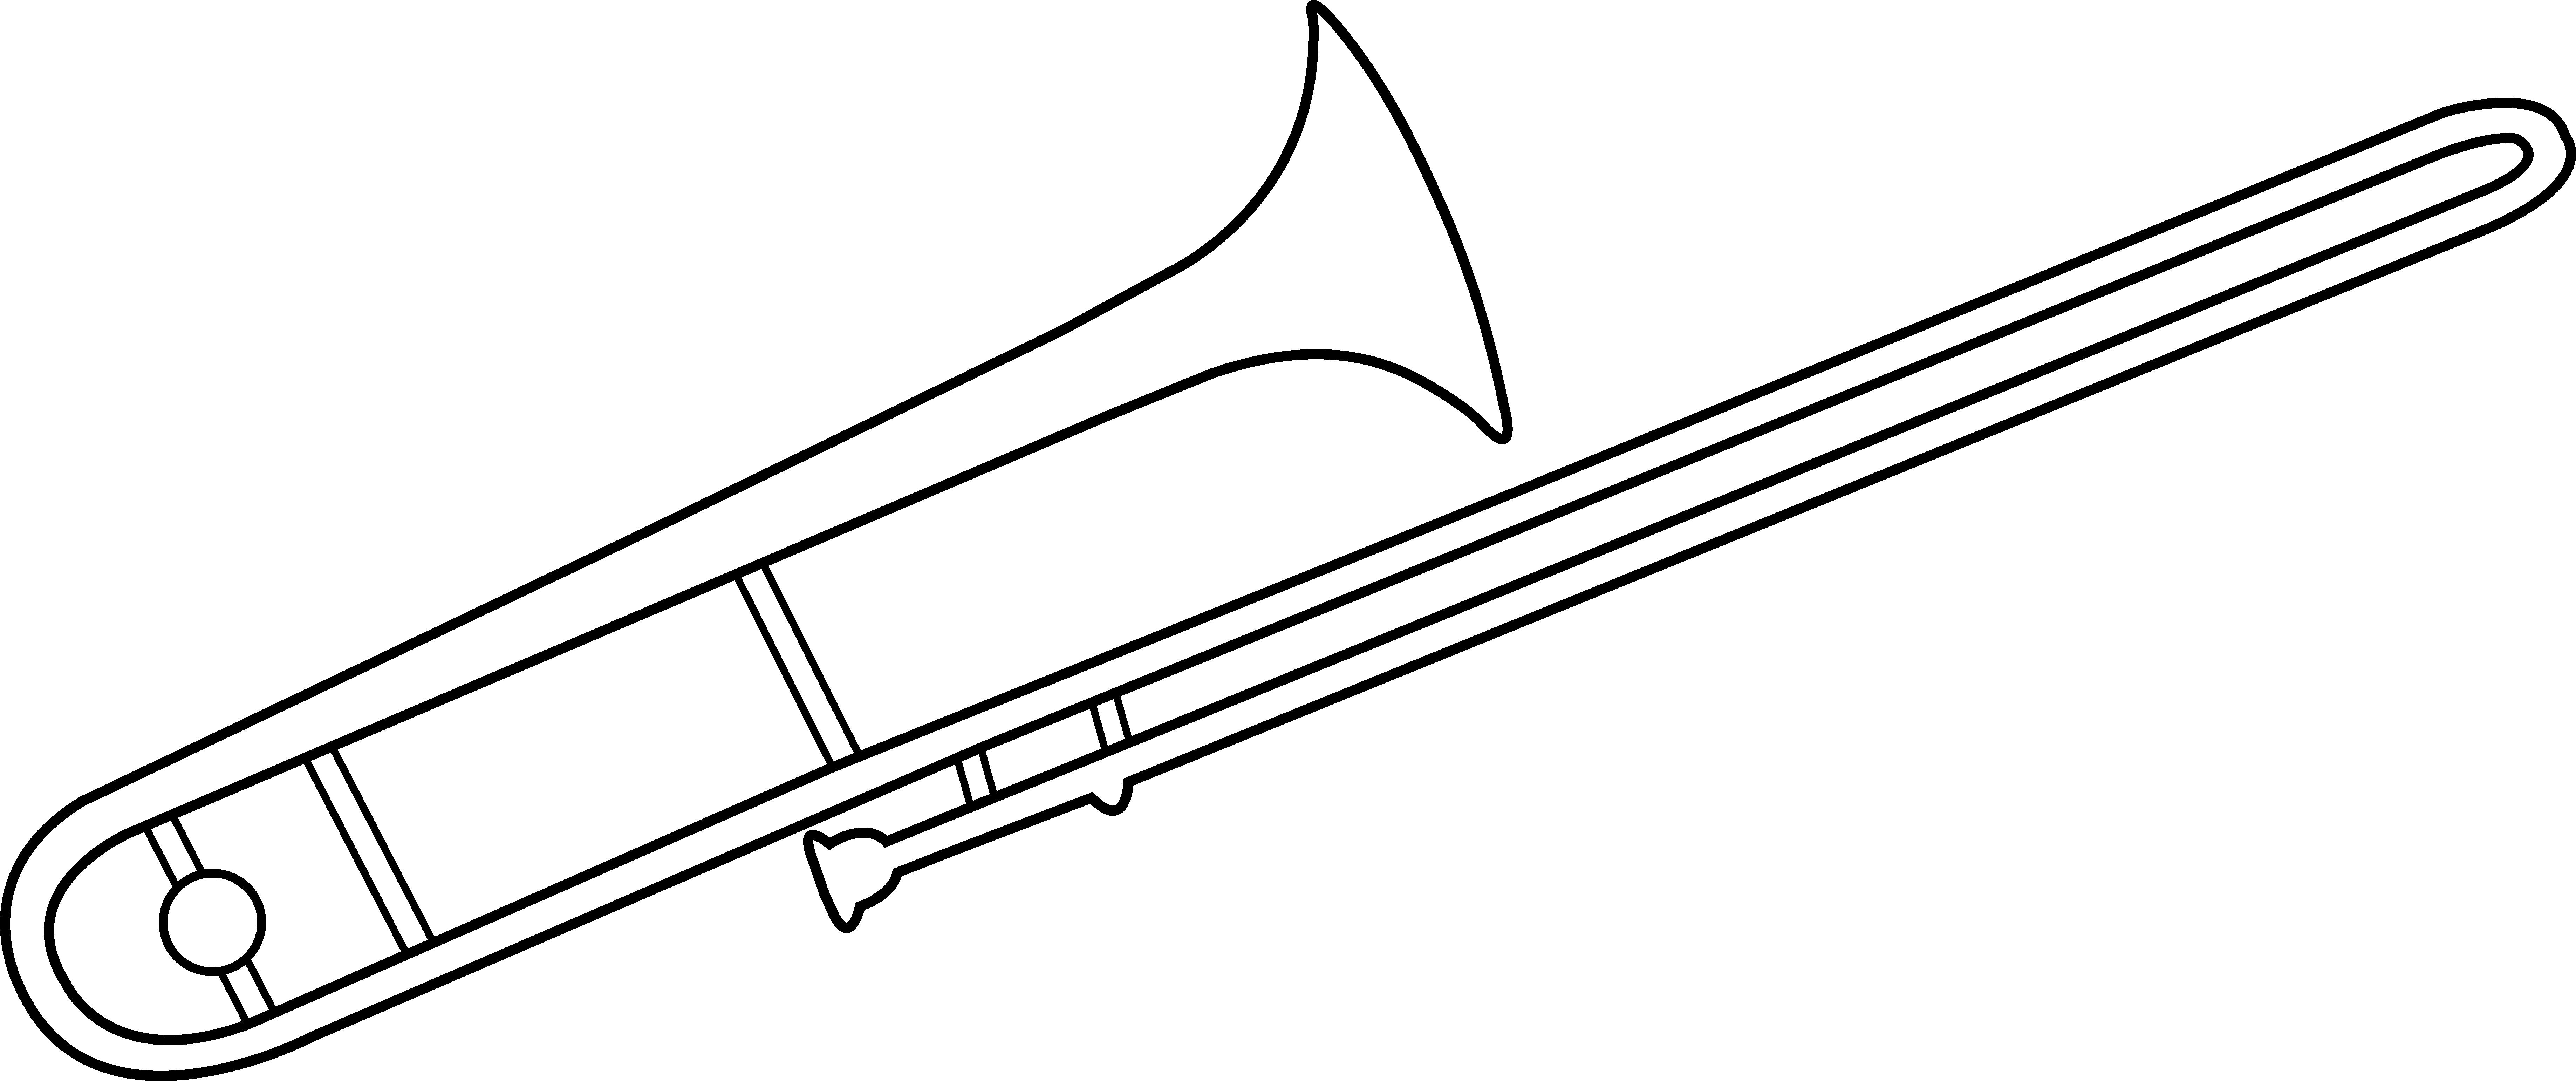 Trombone clipart. Line art free clip